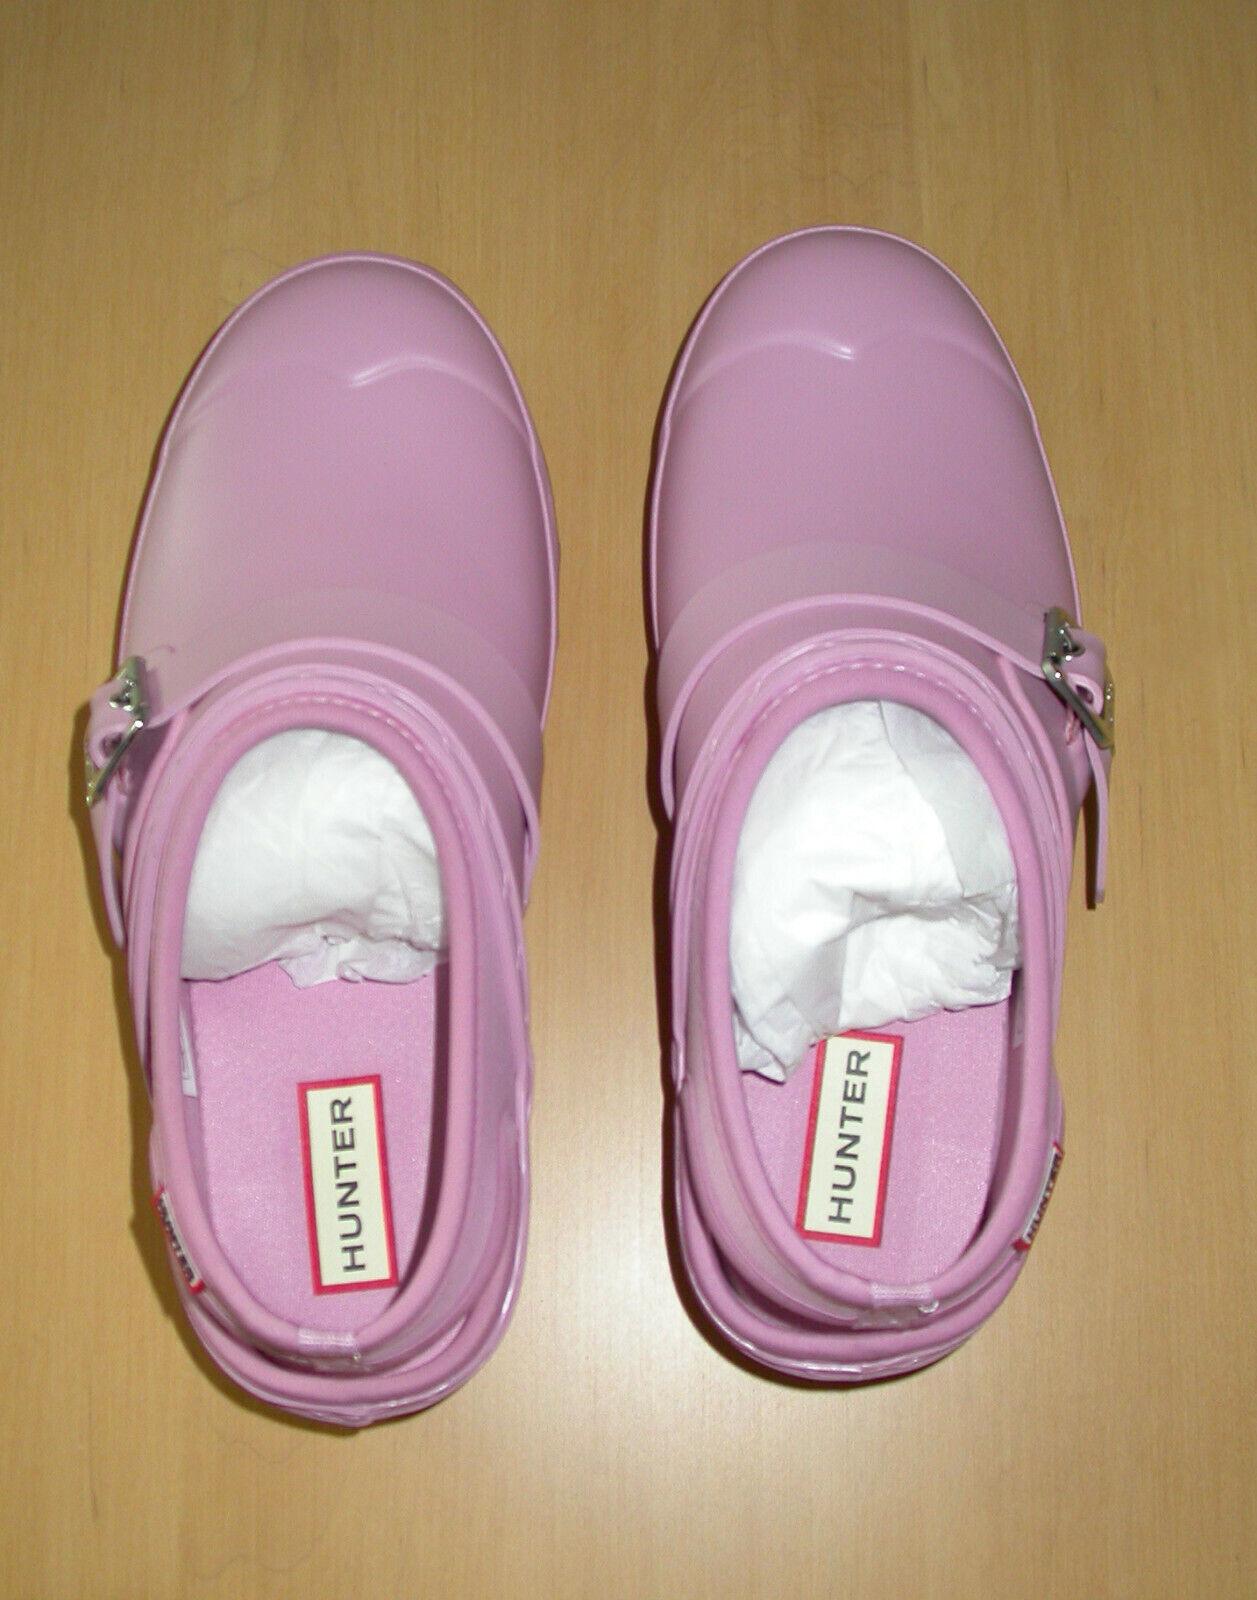 HUNTER Women's Original Clogs in Blossom (Pink) Sz 8 NIB